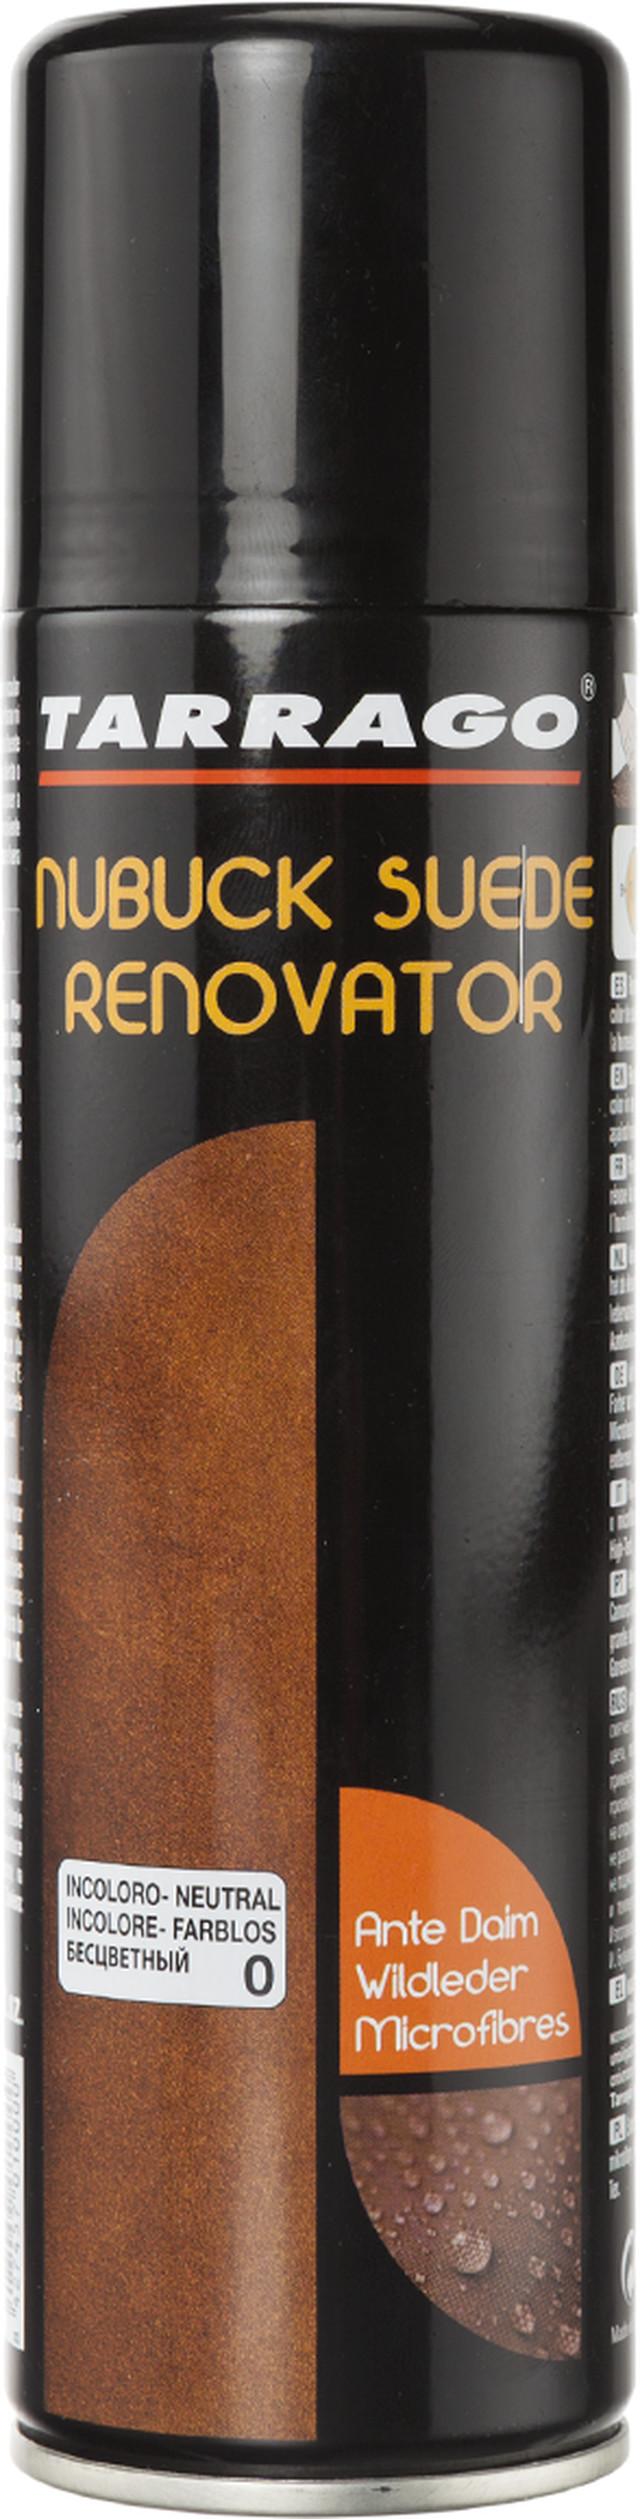 Tarrago Renovator 250ml TCS190000250